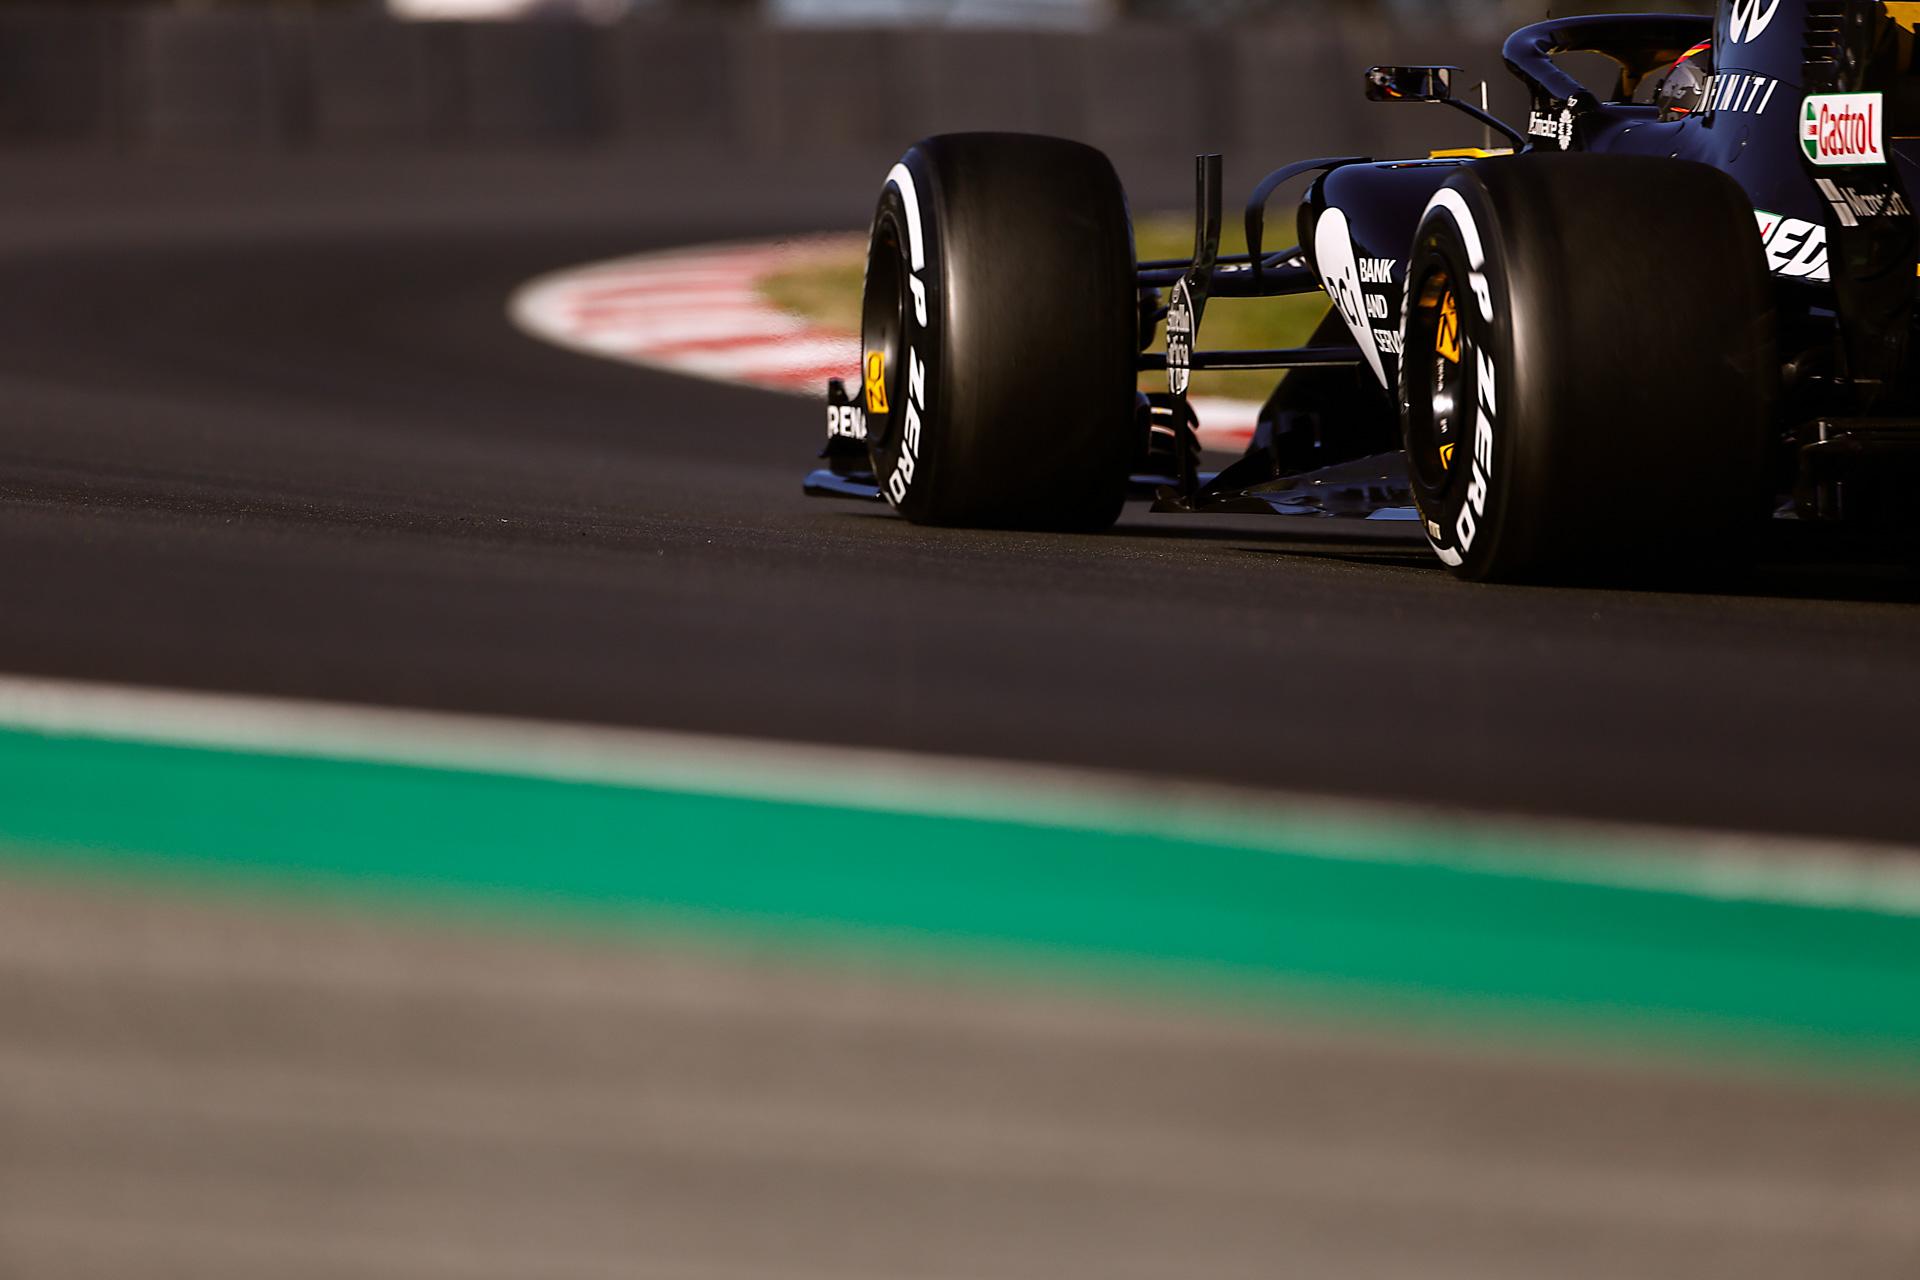 - F1 Test Days - Circuit de Barcelona Catalunya - Spain - 07 March 2018